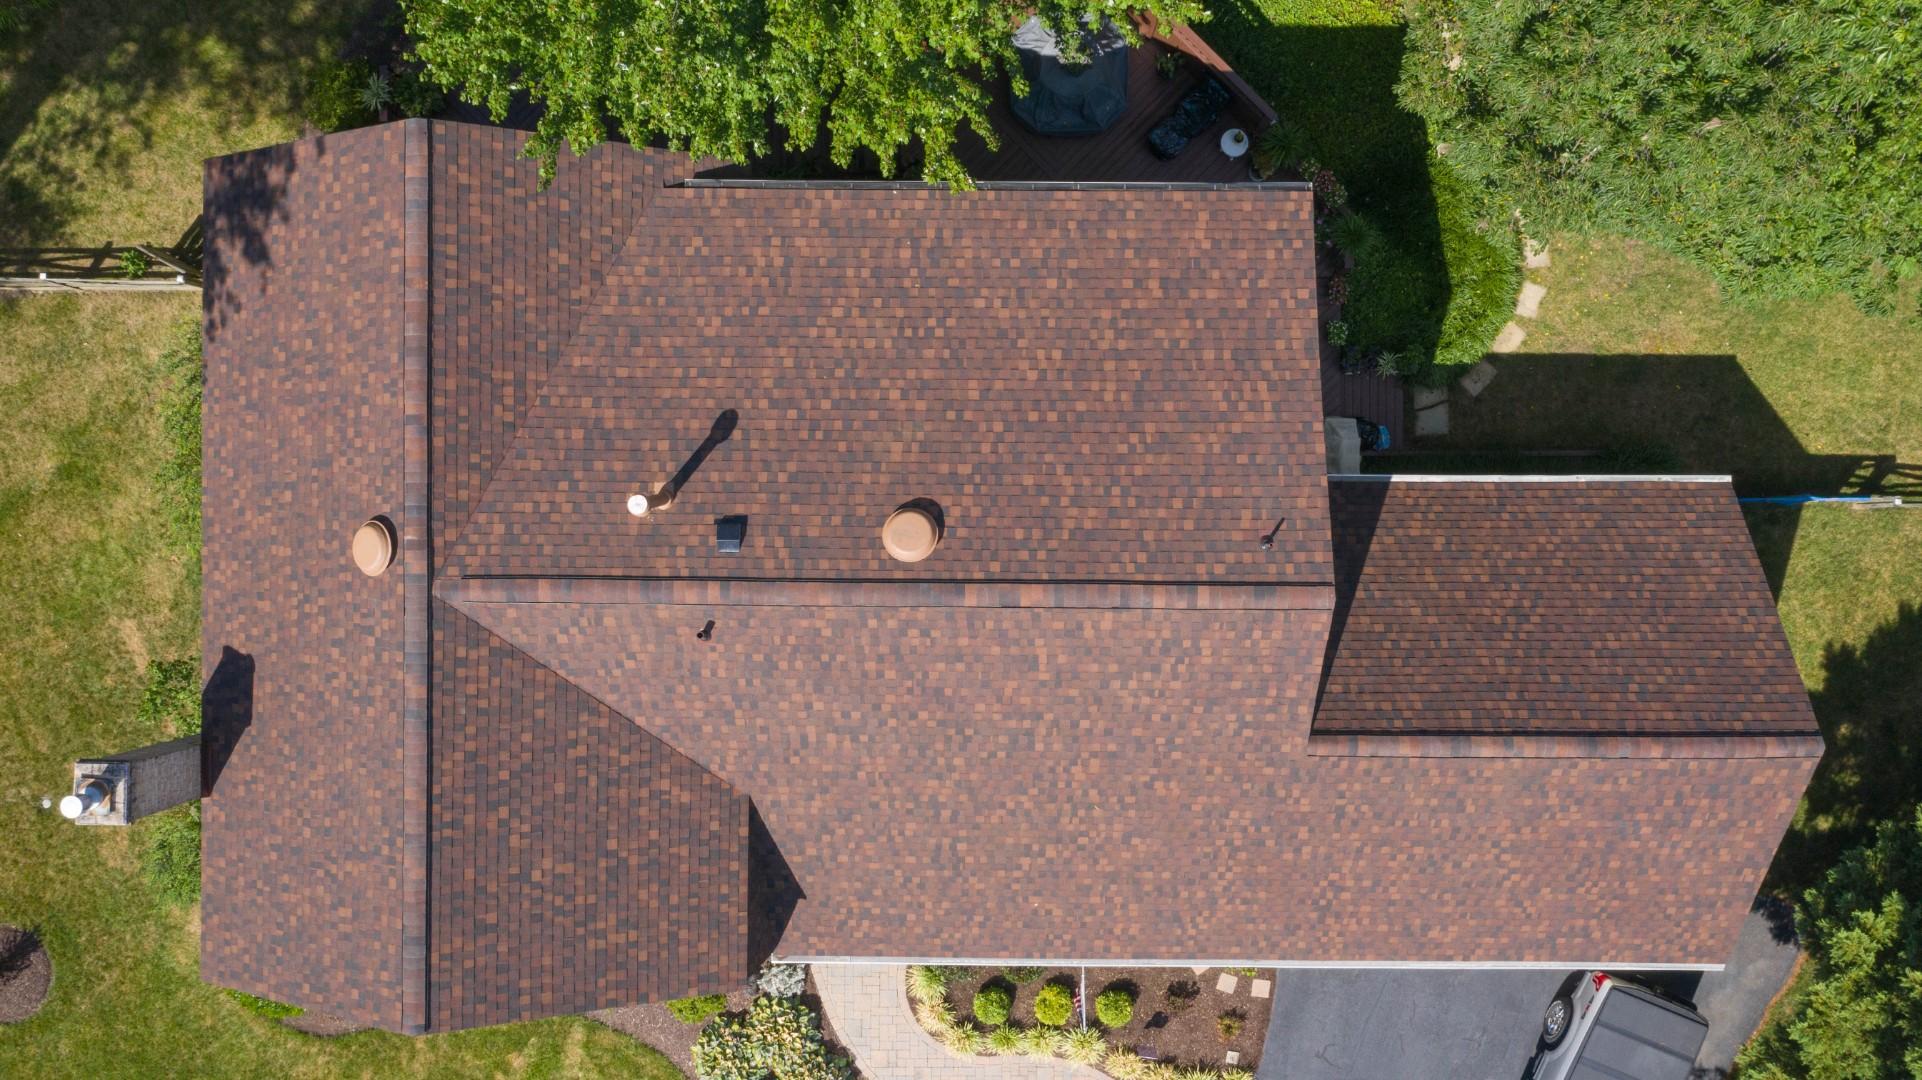 SmartRoof - Residential, Commercial Merrifield VA Roofing Contractors